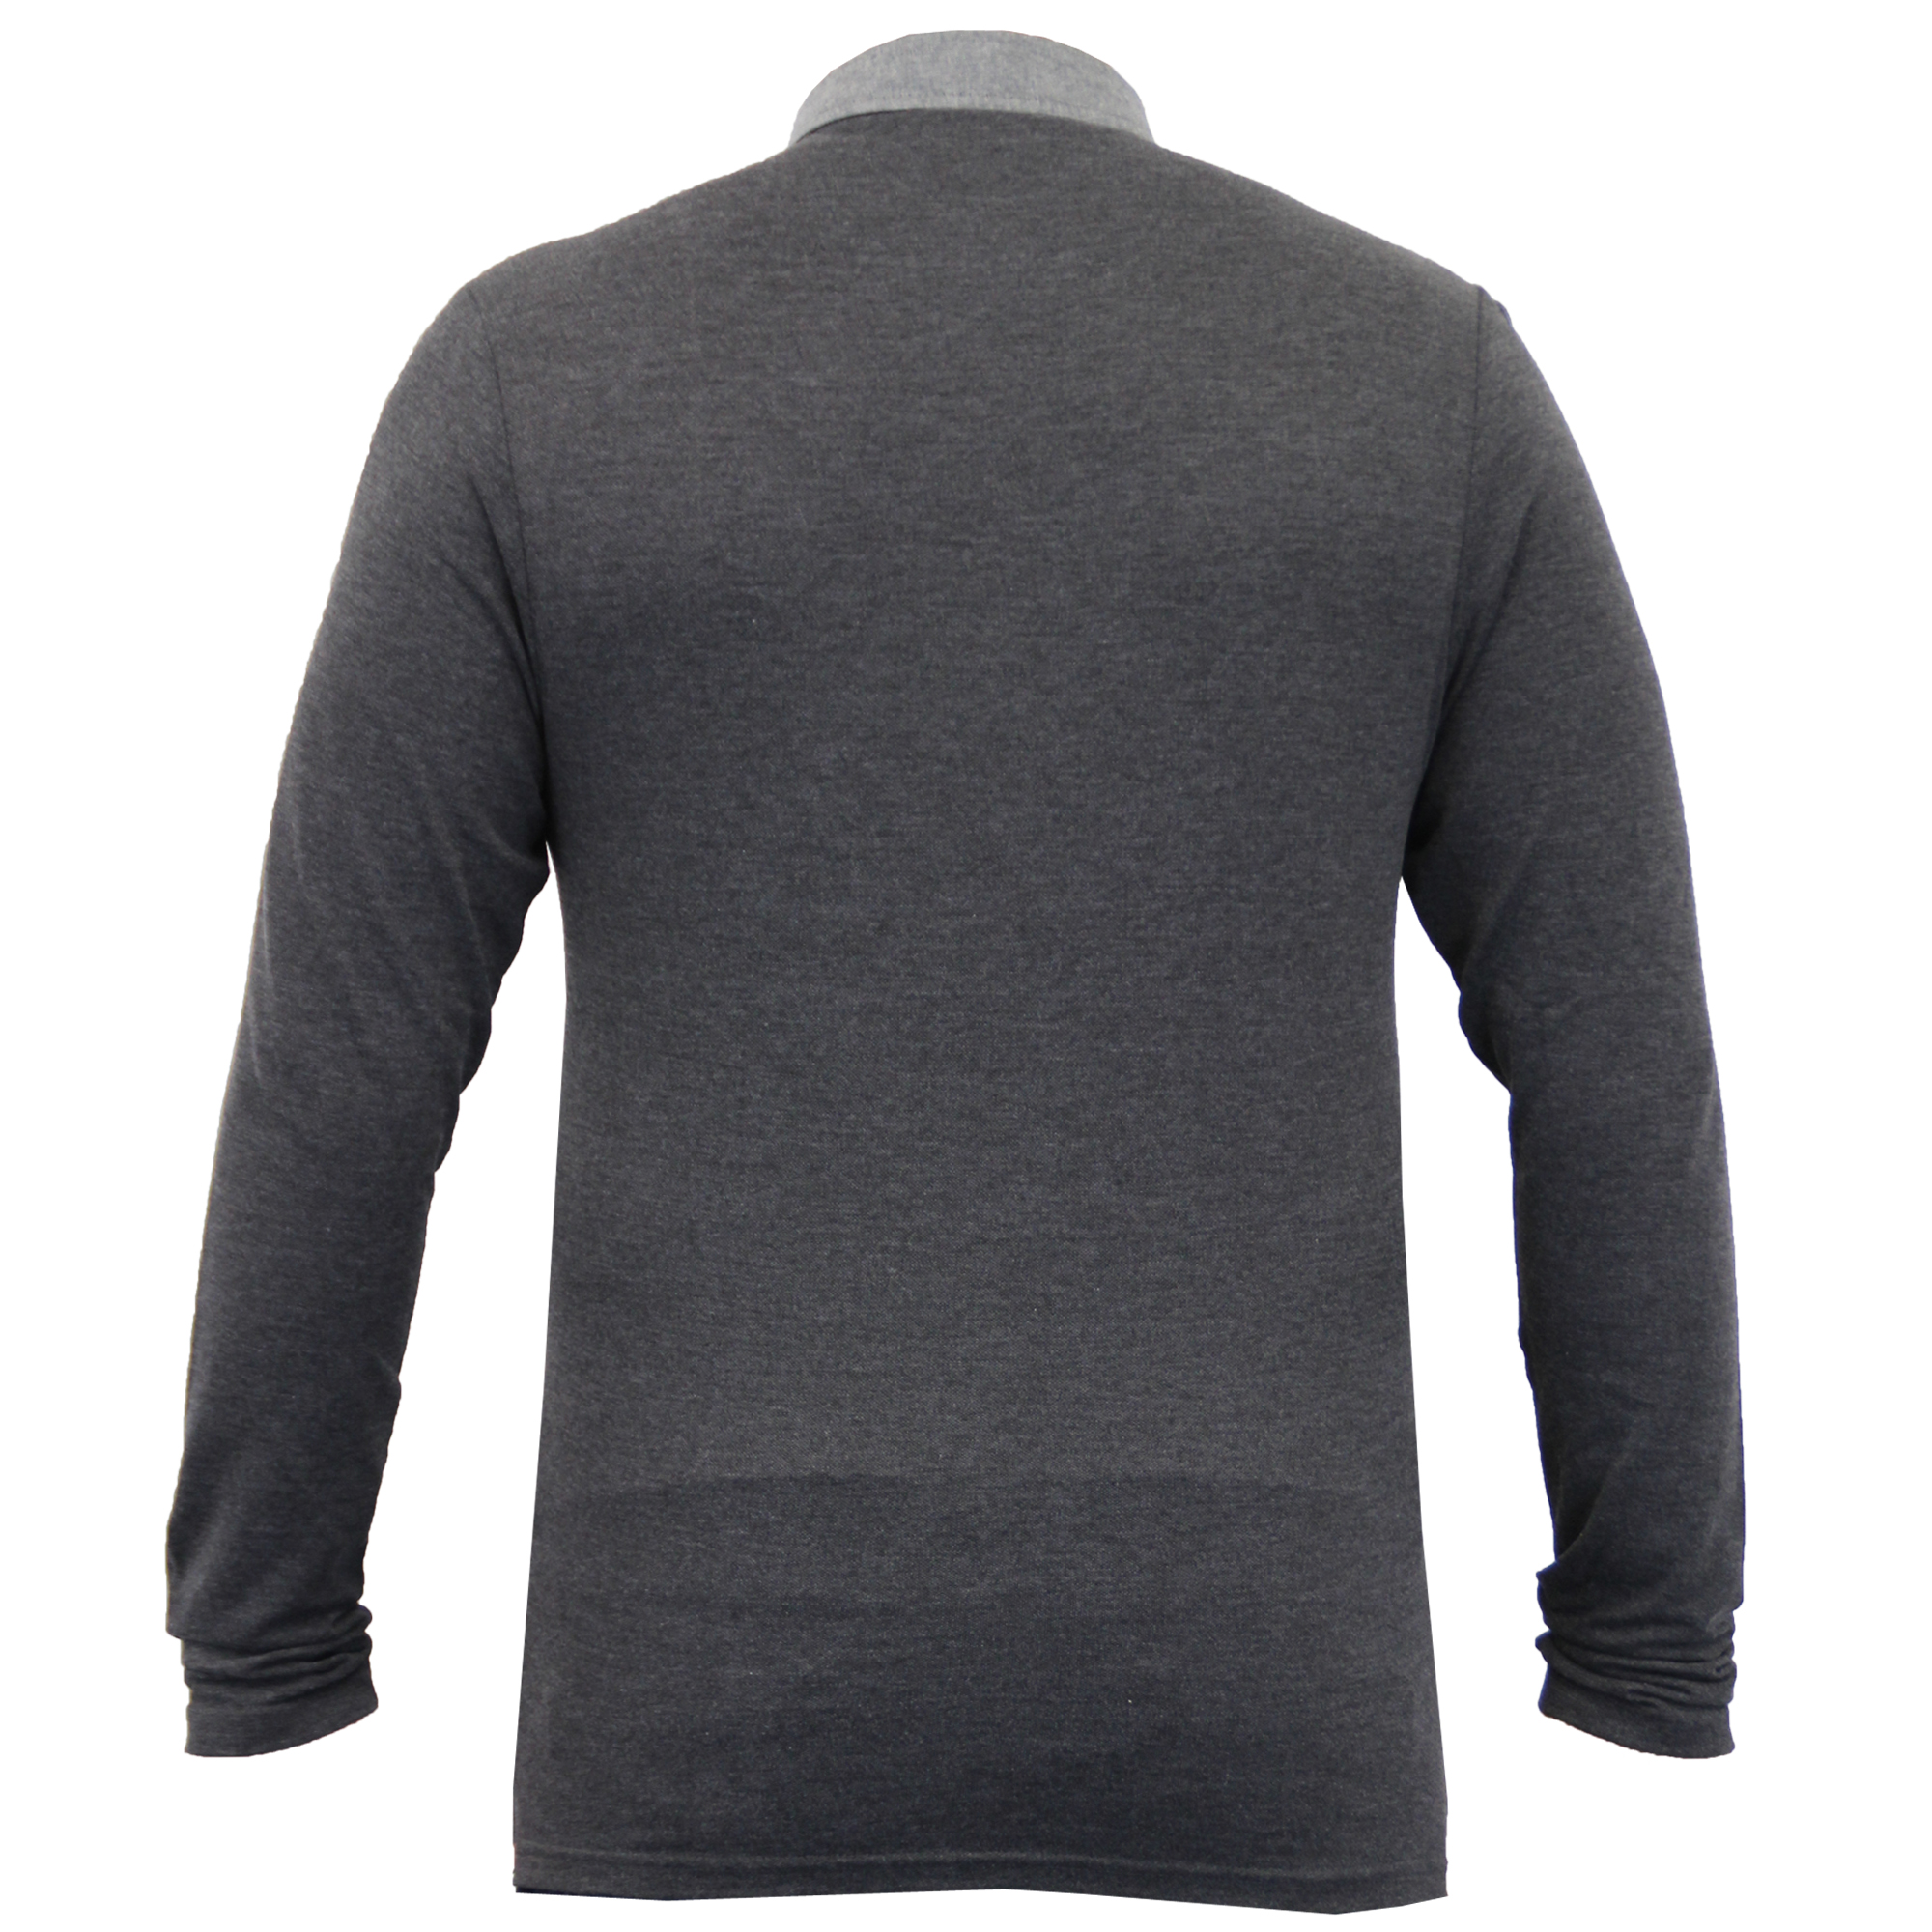 Homme-a-Manches-Longues-Jersey-Top-Brave-Soul-Pique-Polo-T-Shirt-A-Col-Ete-Neuf miniature 16